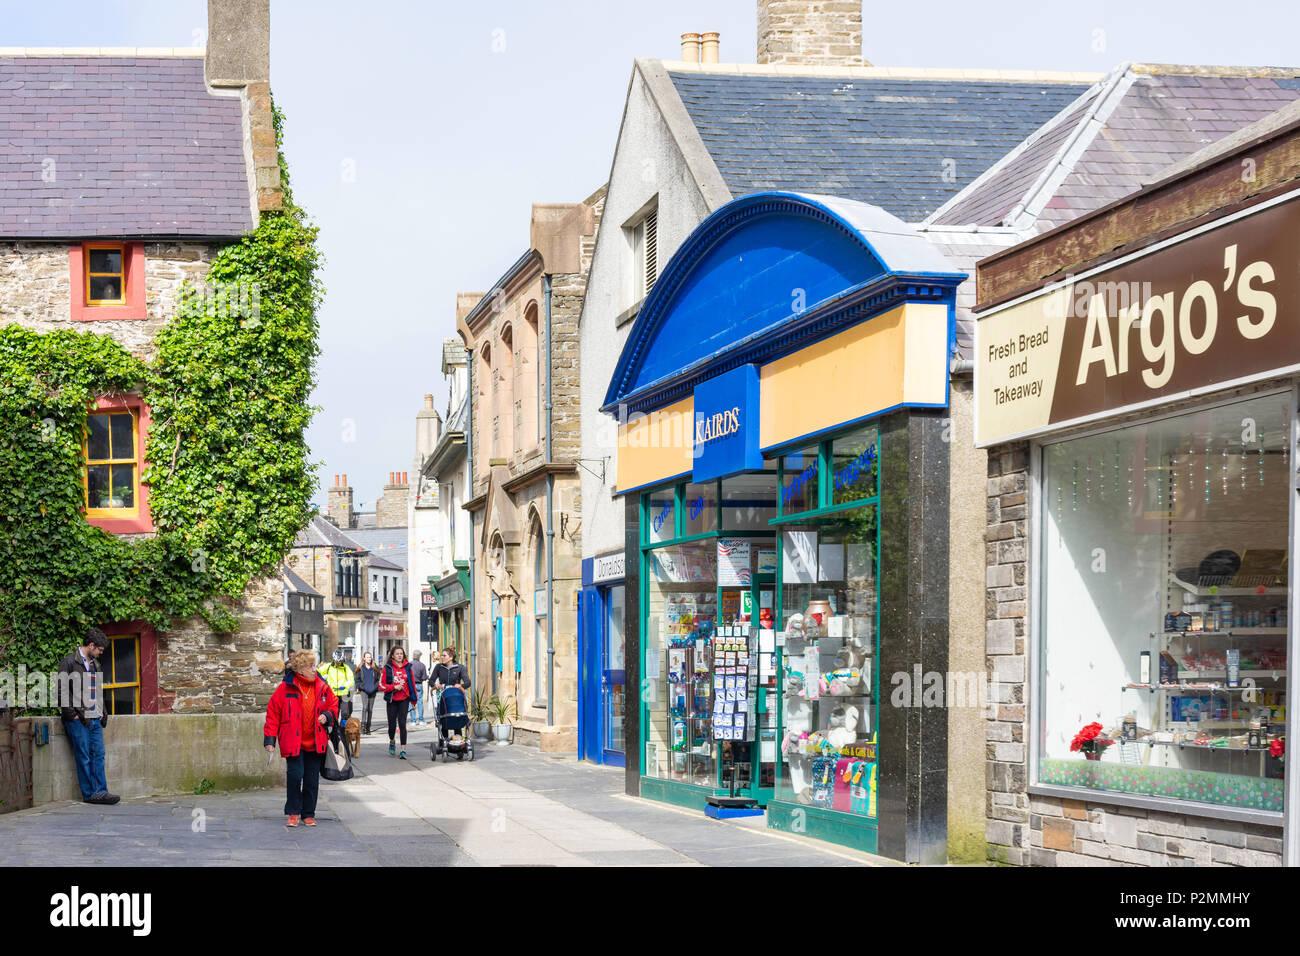 Albert Street, Kirkwall, Mainland, Orkney Islands, Northern Isles, Scotland, United Kingdom - Stock Image